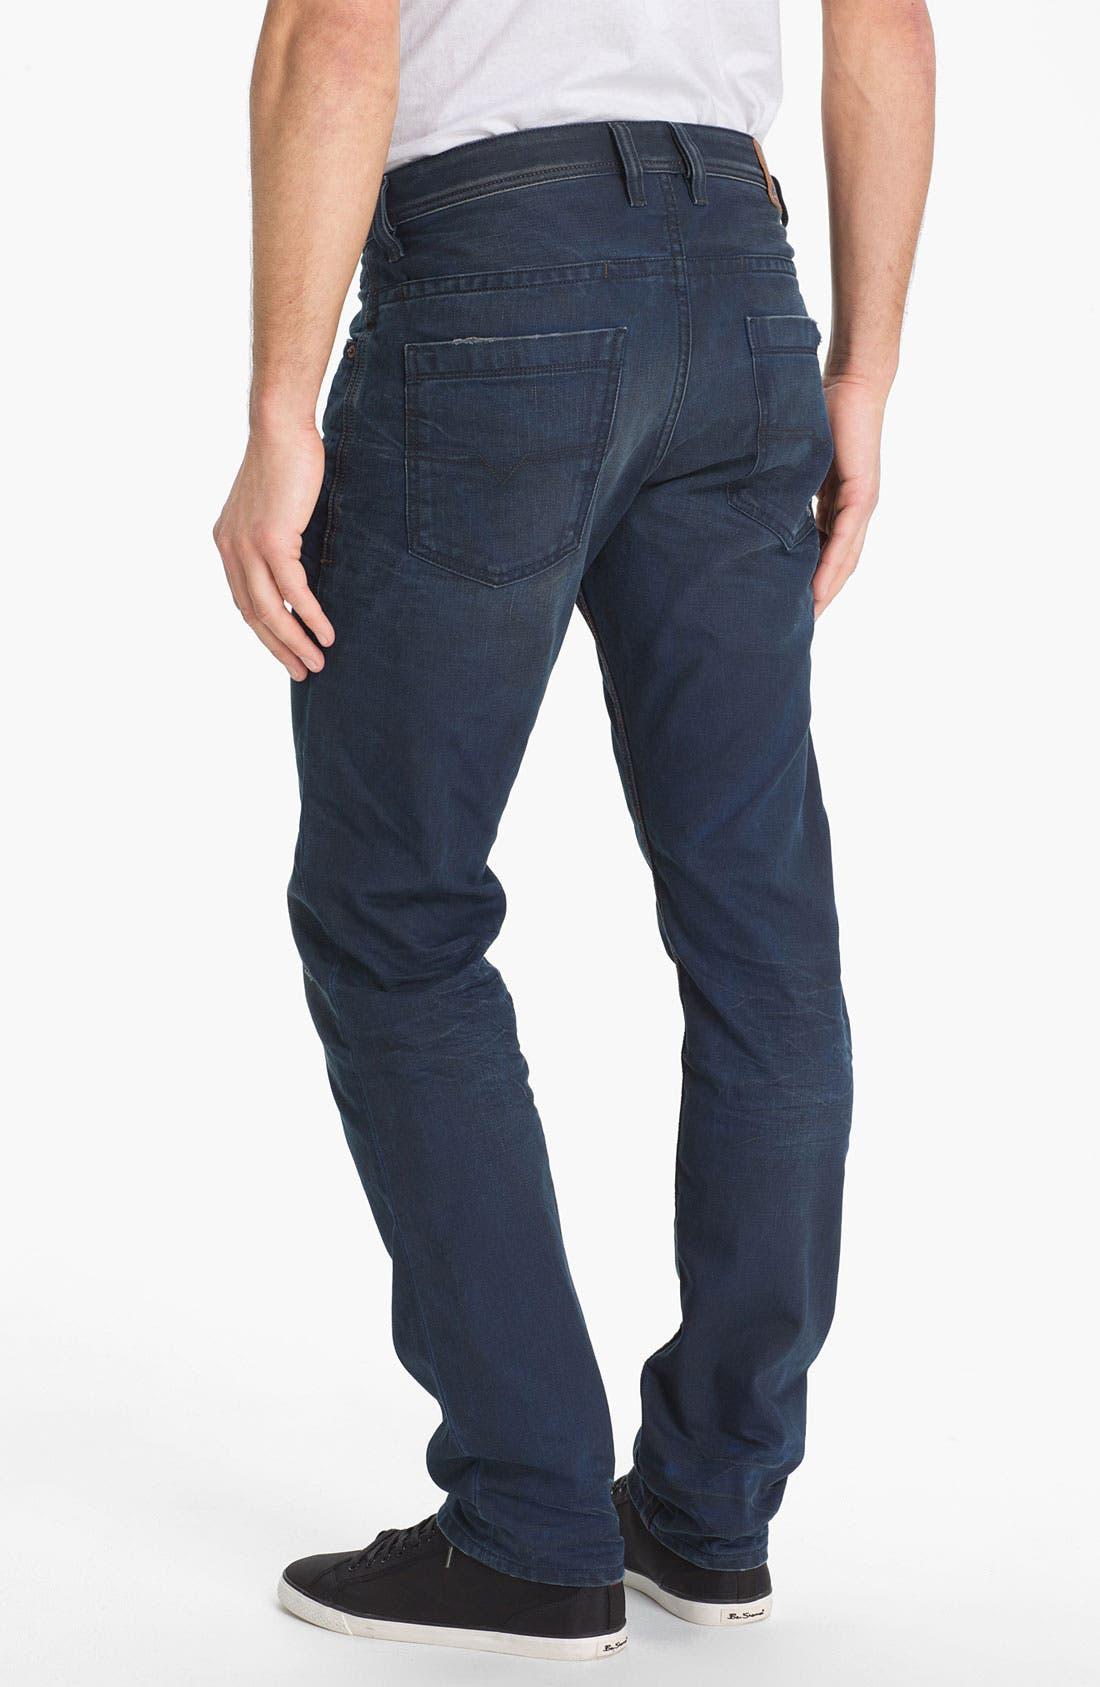 Alternate Image 1 Selected - DIESEL® 'Braddom' Slim Tapered Leg Jeans (0811K)